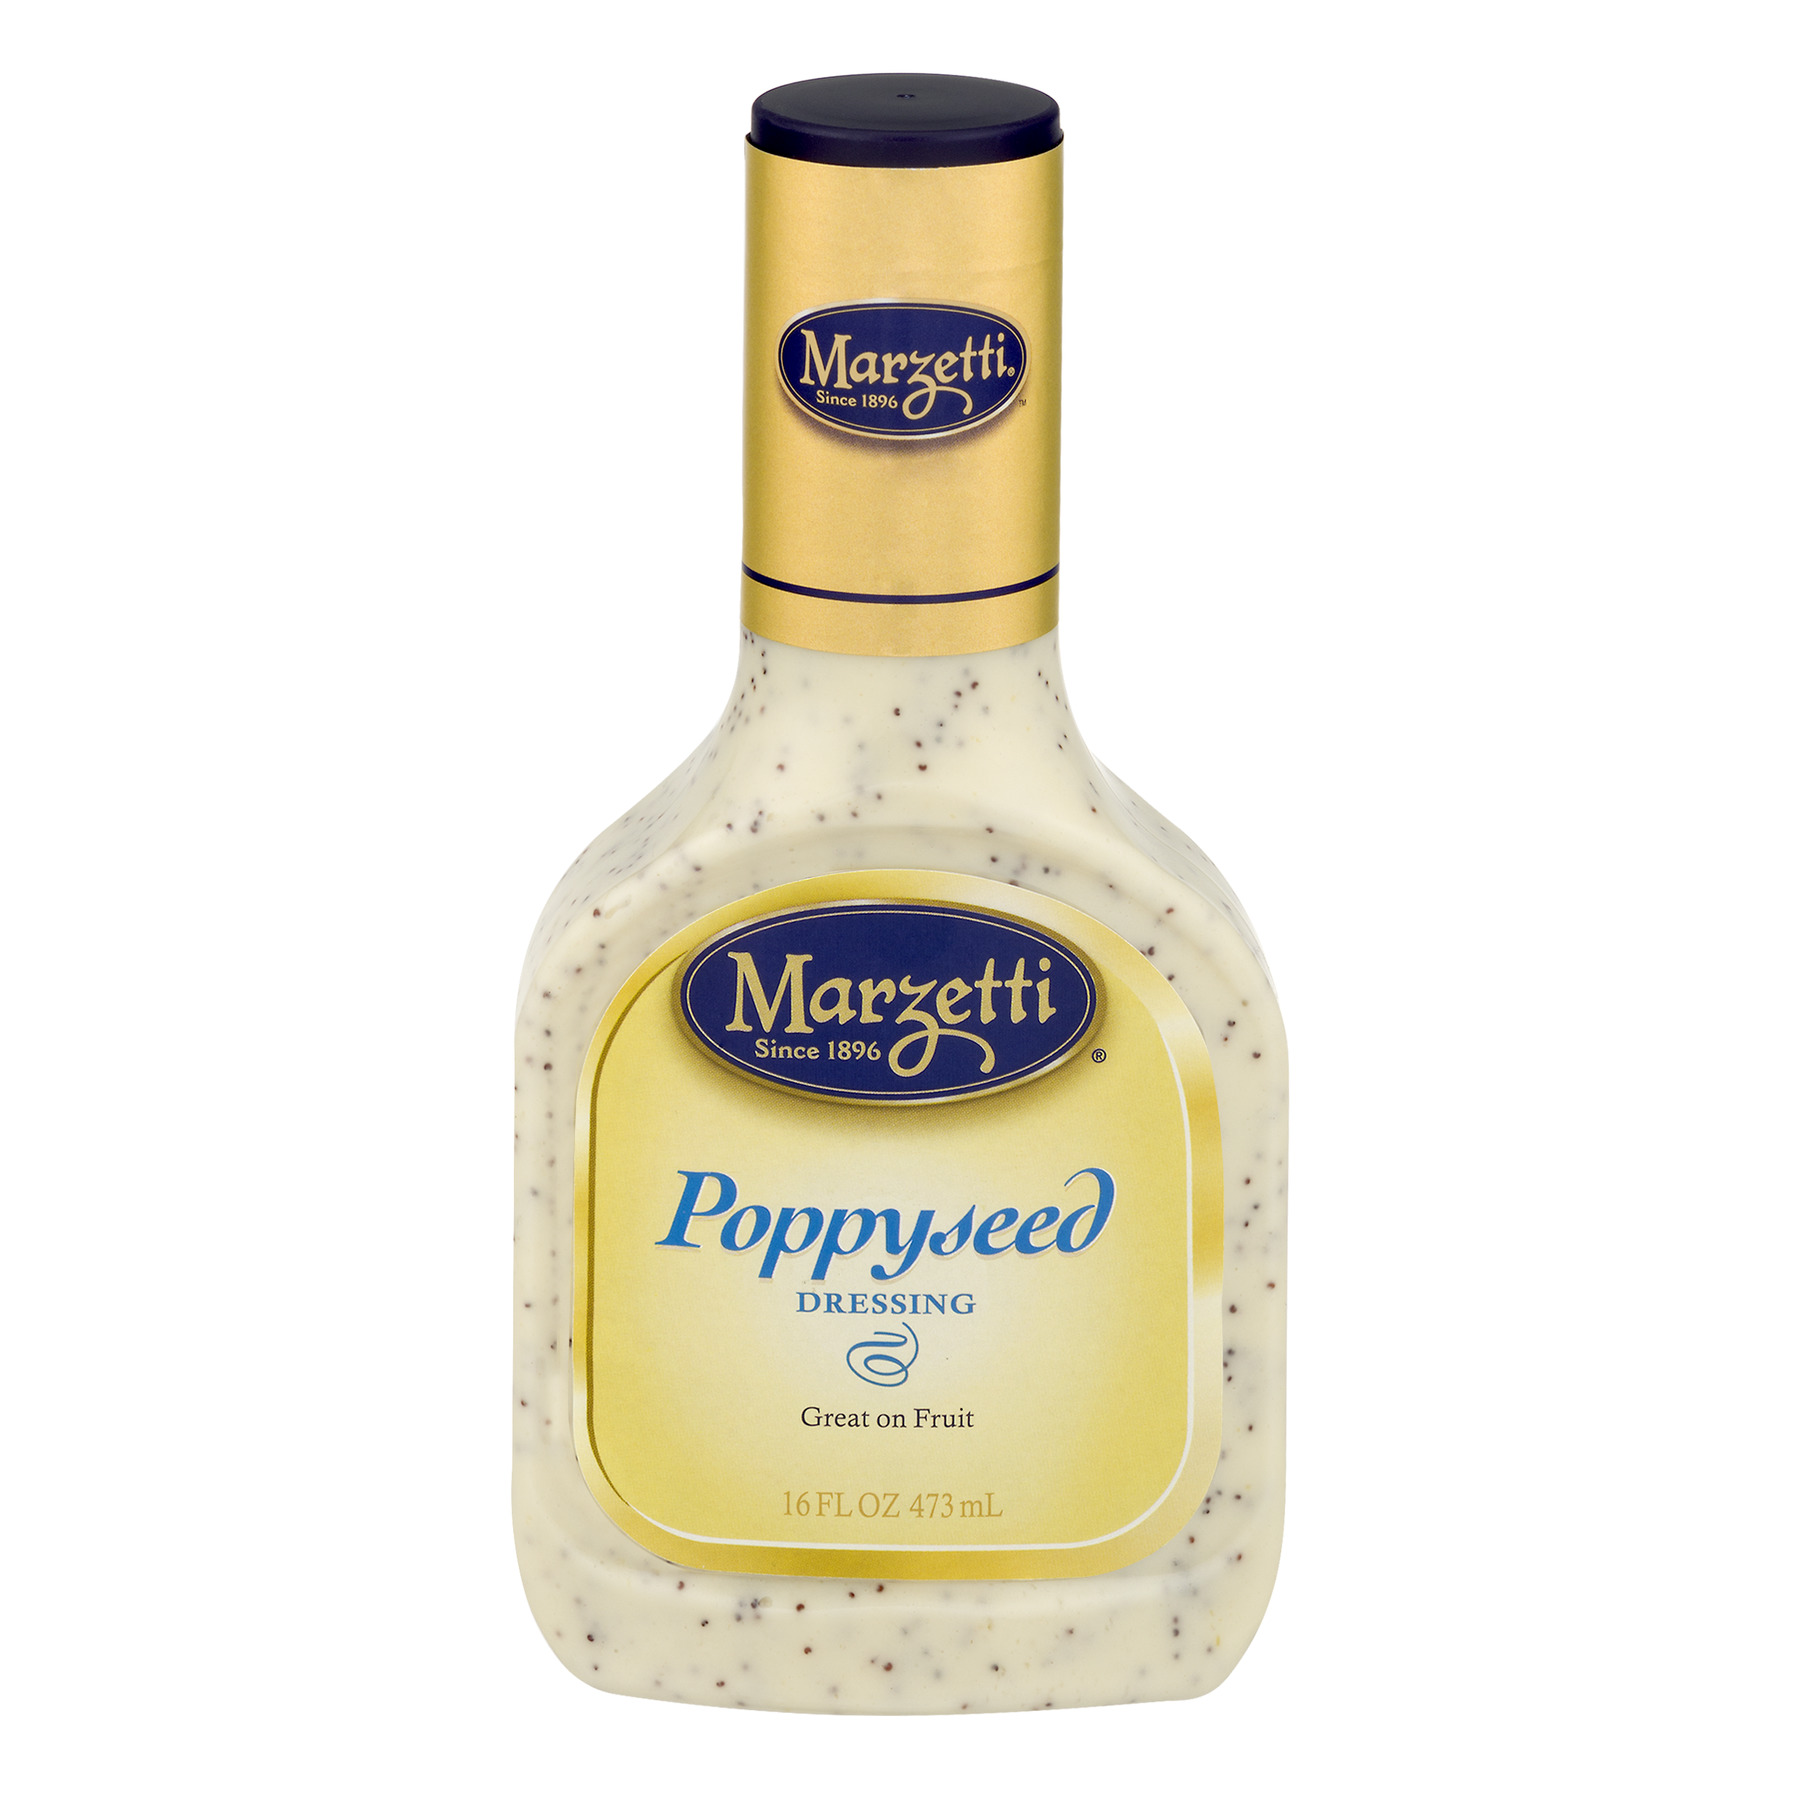 Marzetti Dressing Poppyseed 160 FL OZ Walmartcom